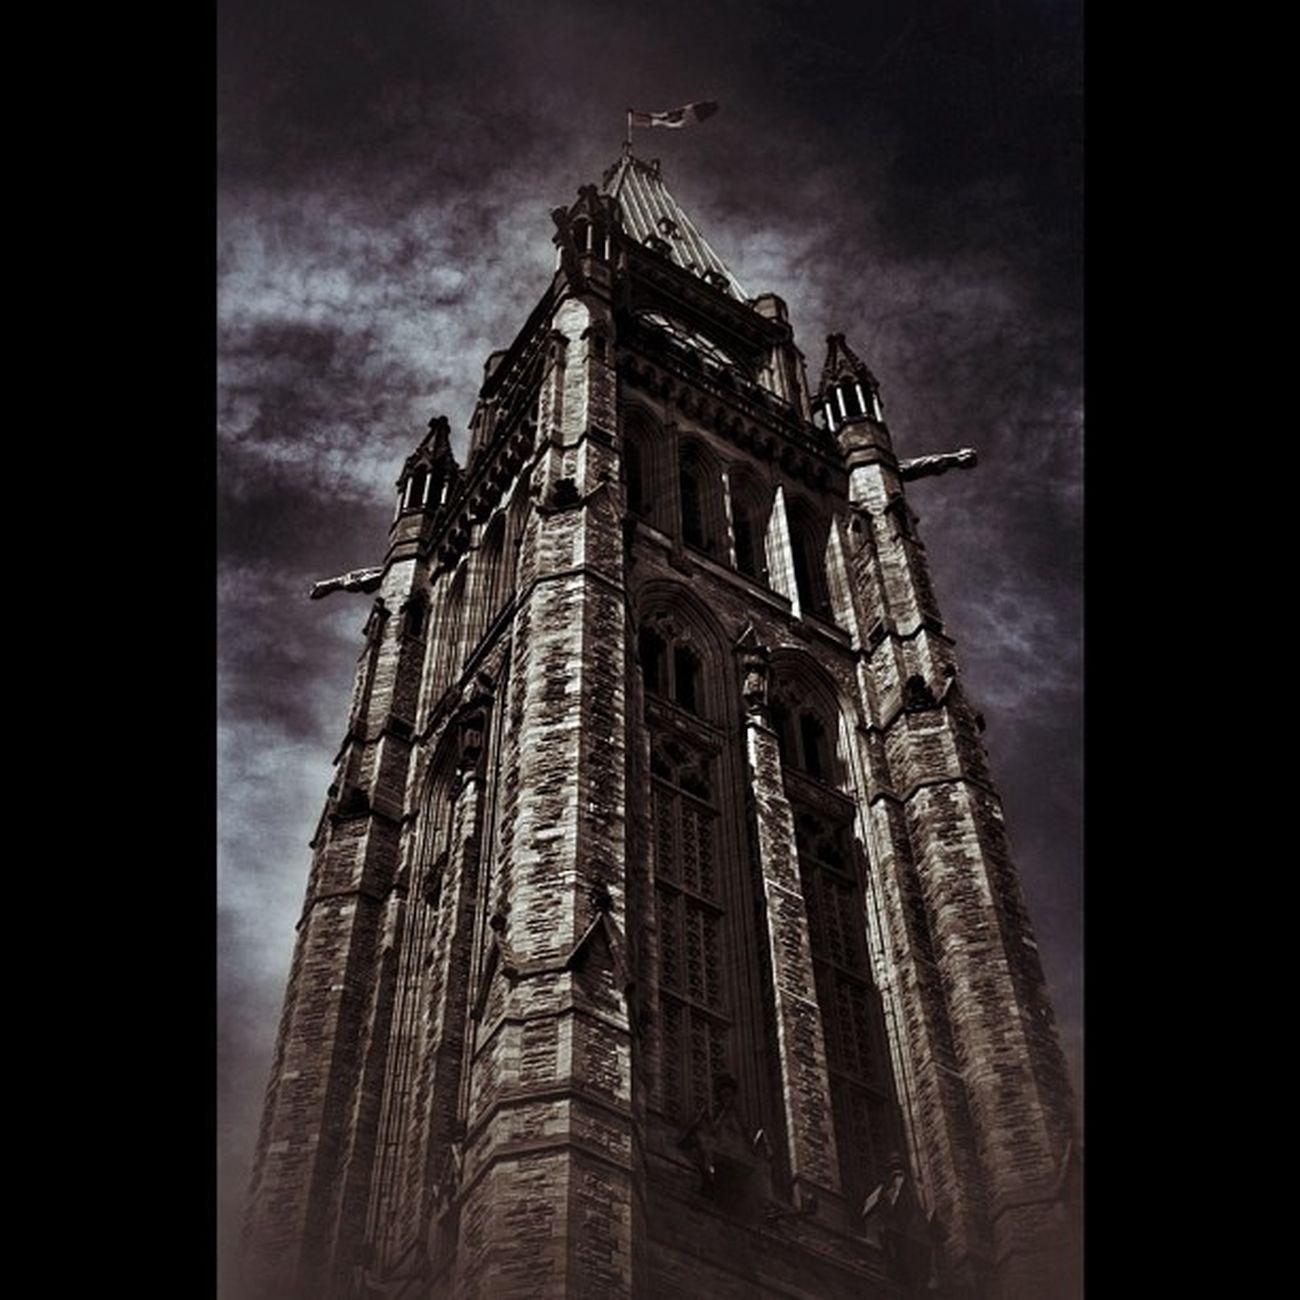 #pf_arts #masters_of_darkness #ig_dungeon Darkness Building Dark Edit Igdungeon Rsa_dark Masters_of_darkness Dark_dominion United_by_darkness Igd_realmofthedead Ig_4every1_spooky Pf_arts Thehorrorgallery Ig_dungeon